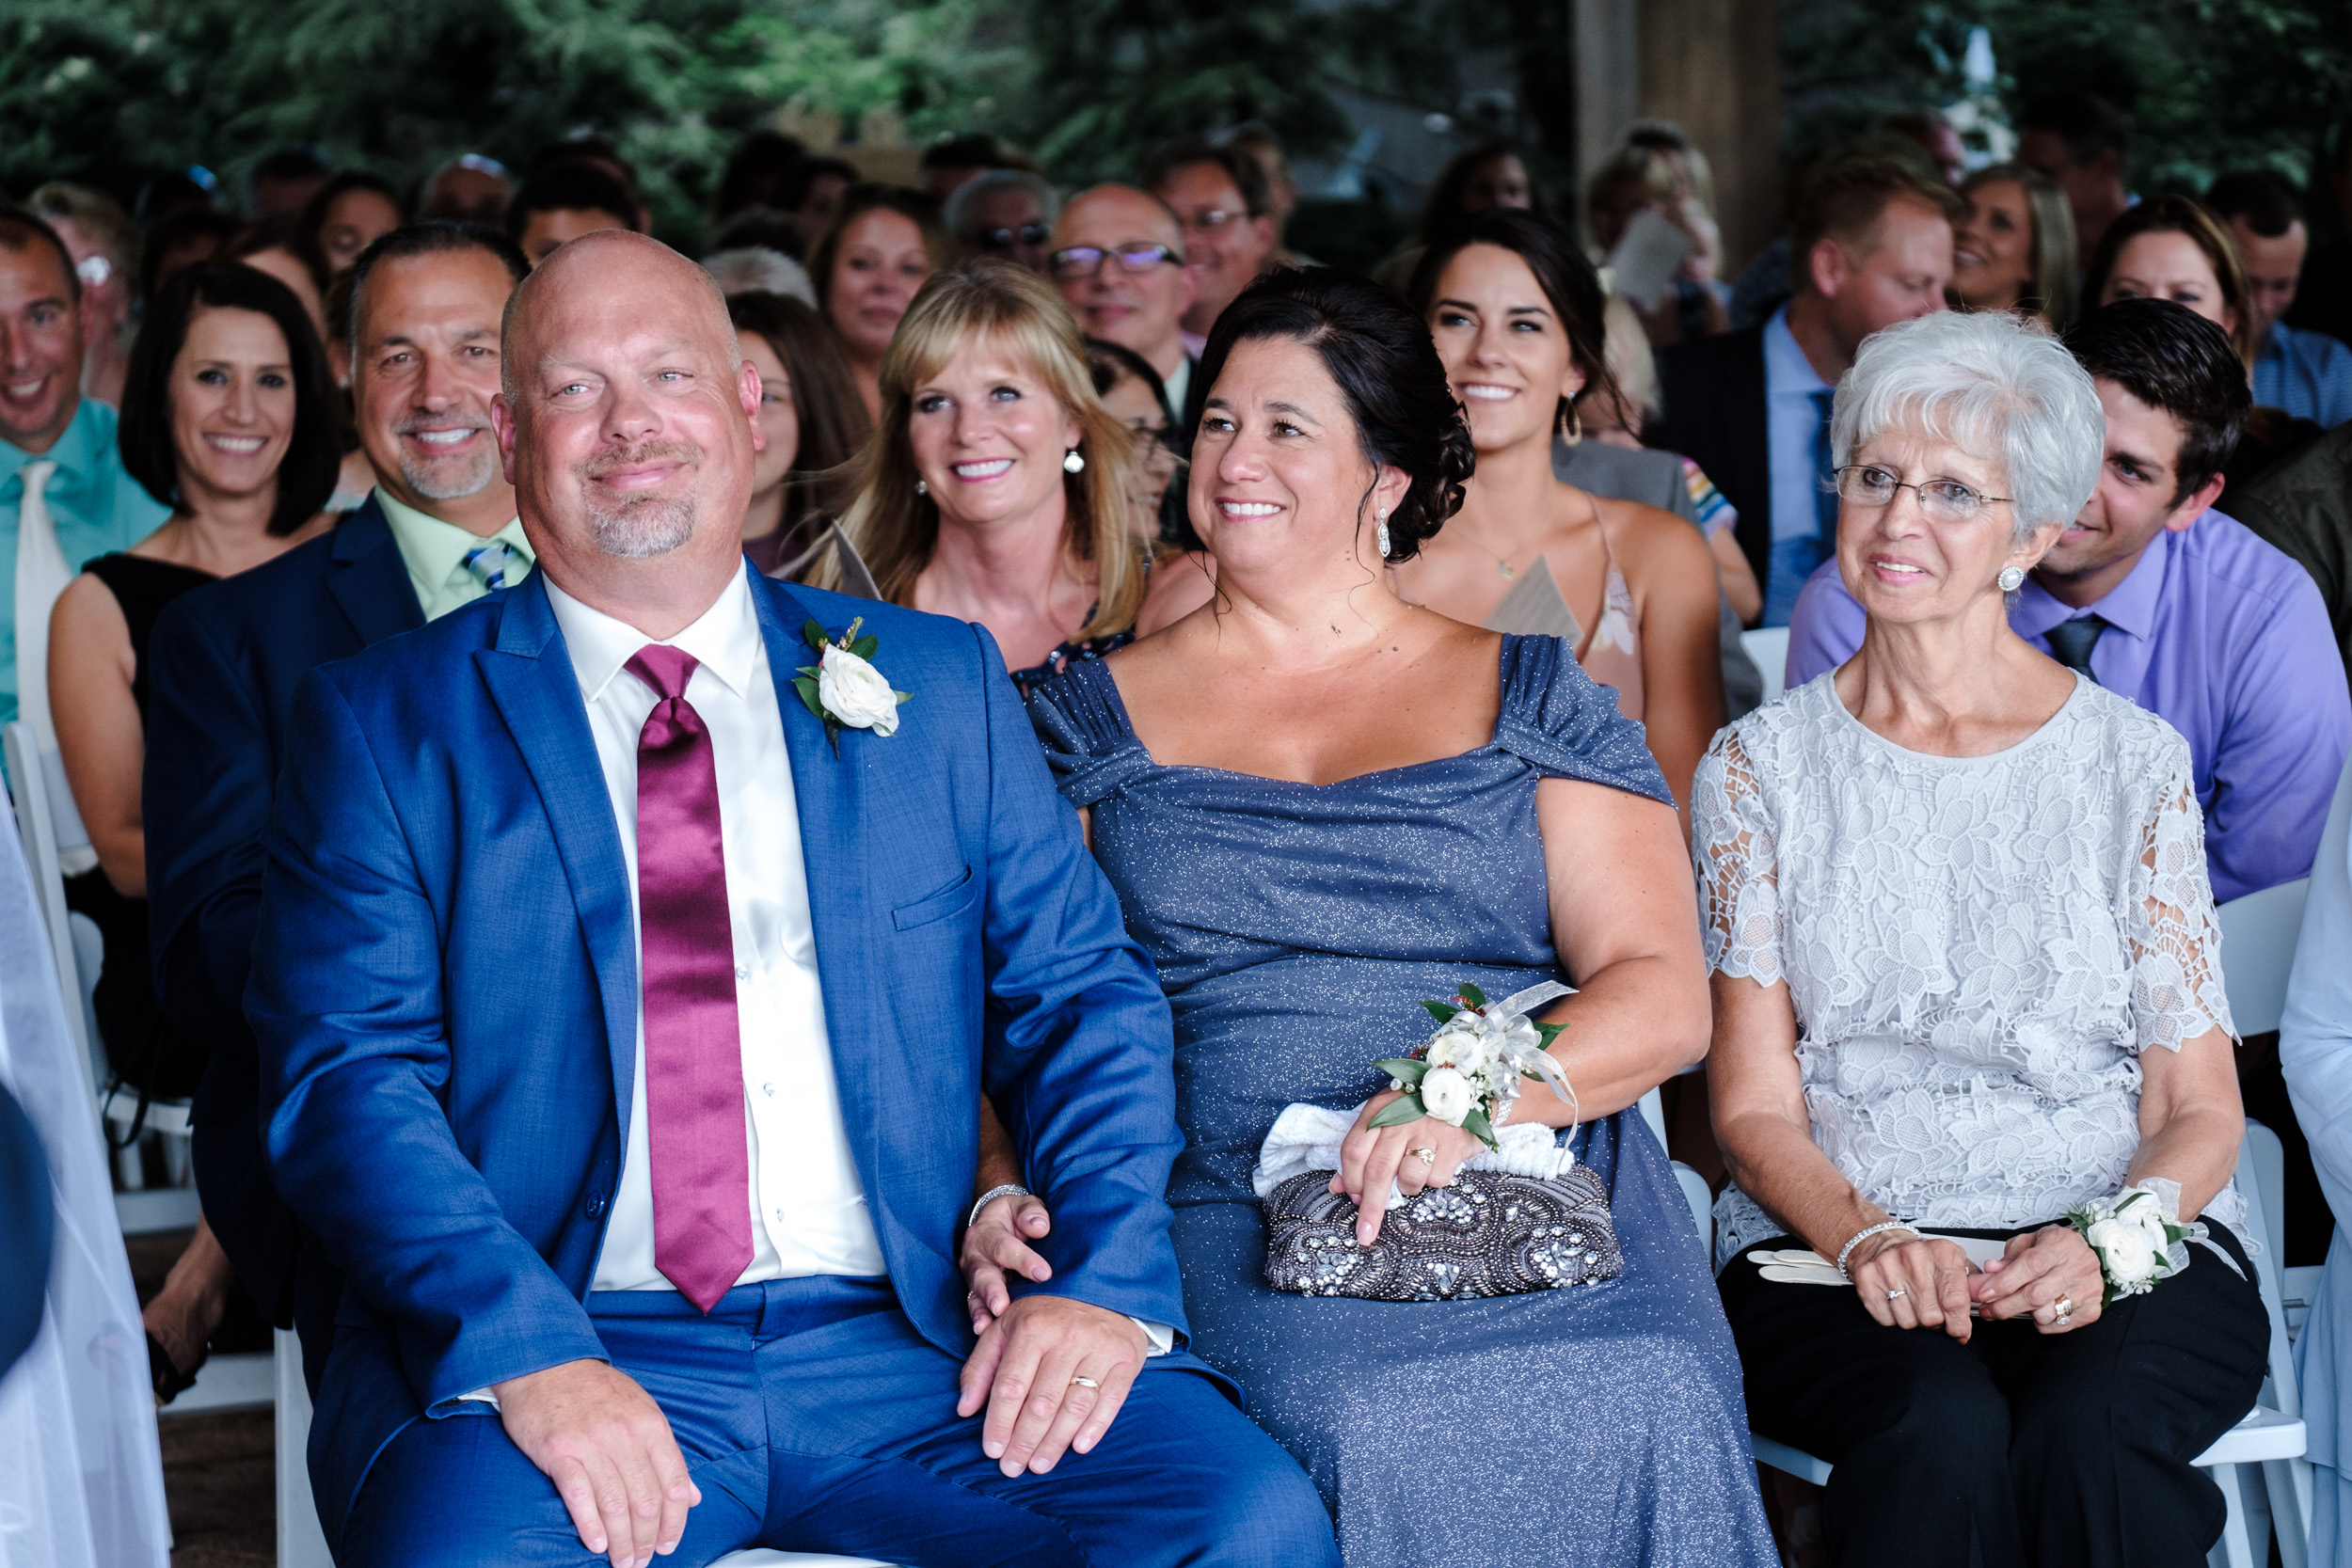 18-09-01 BAP Kiley-Trevor-Anderson-Gardens-Wedding-41.jpg